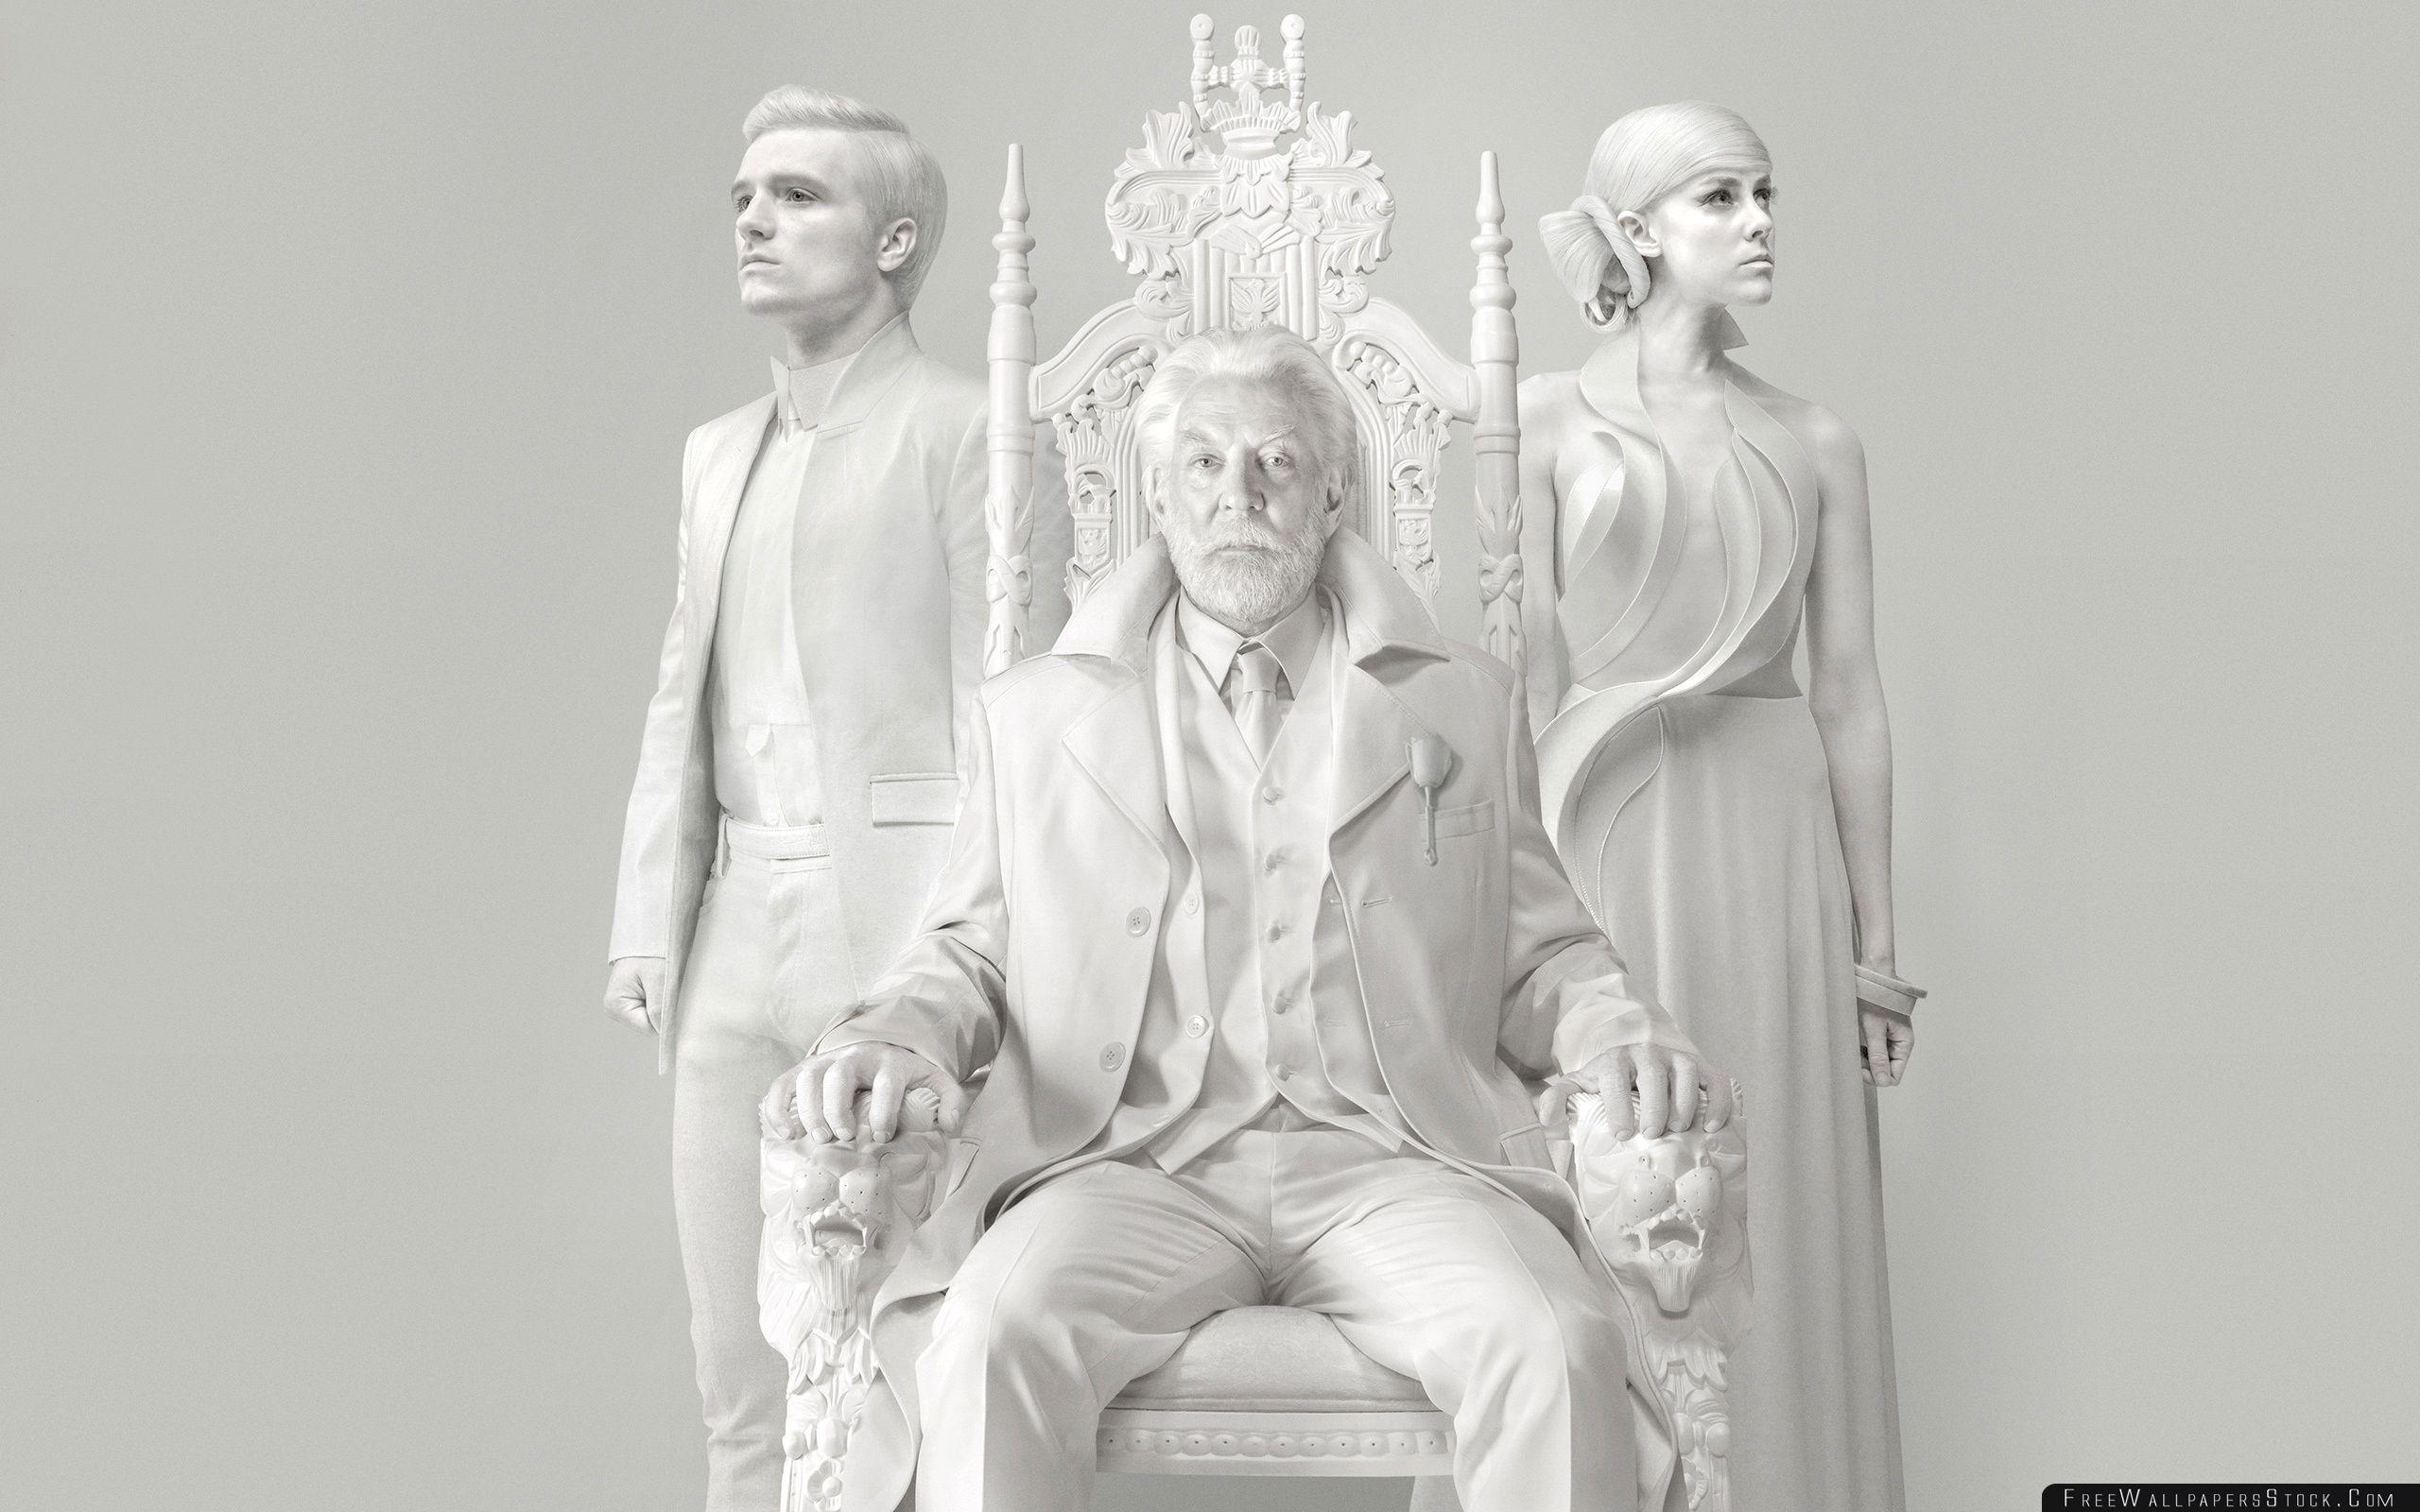 Download Free Wallpaper The Hunger Games Mockingjay Peeta Johanna President Coriolanus Snow